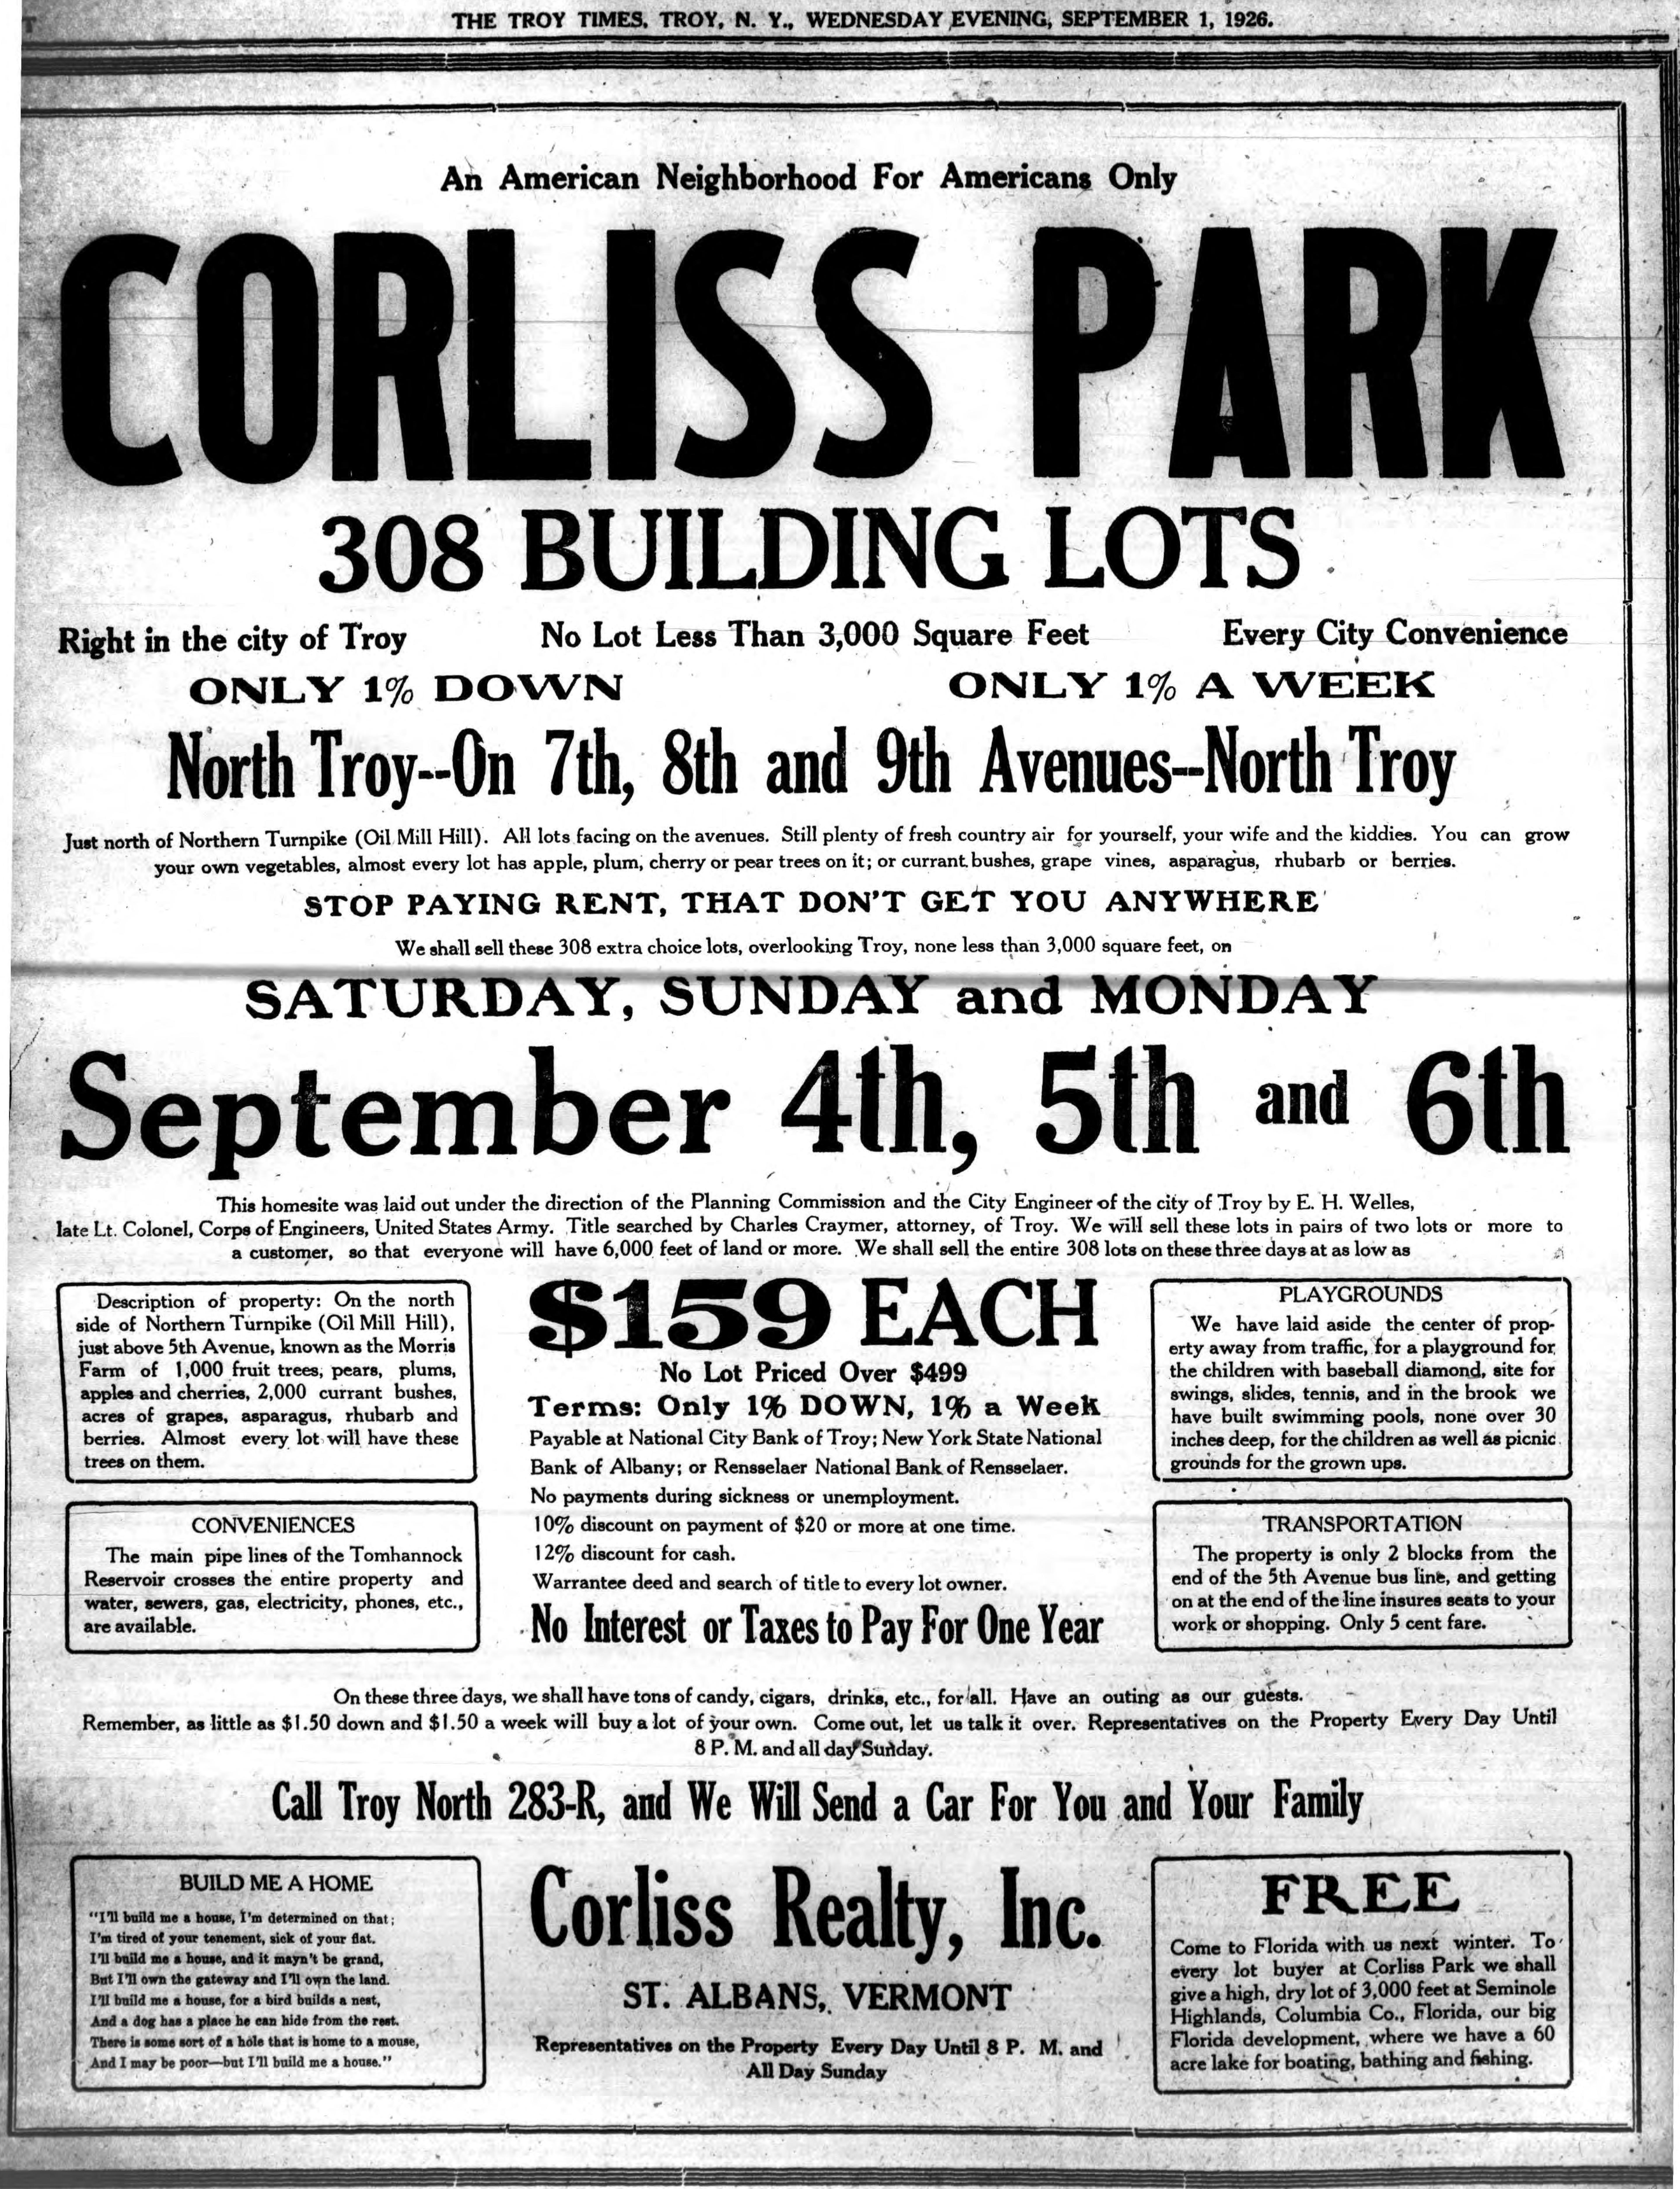 1933 Corliss Park ad